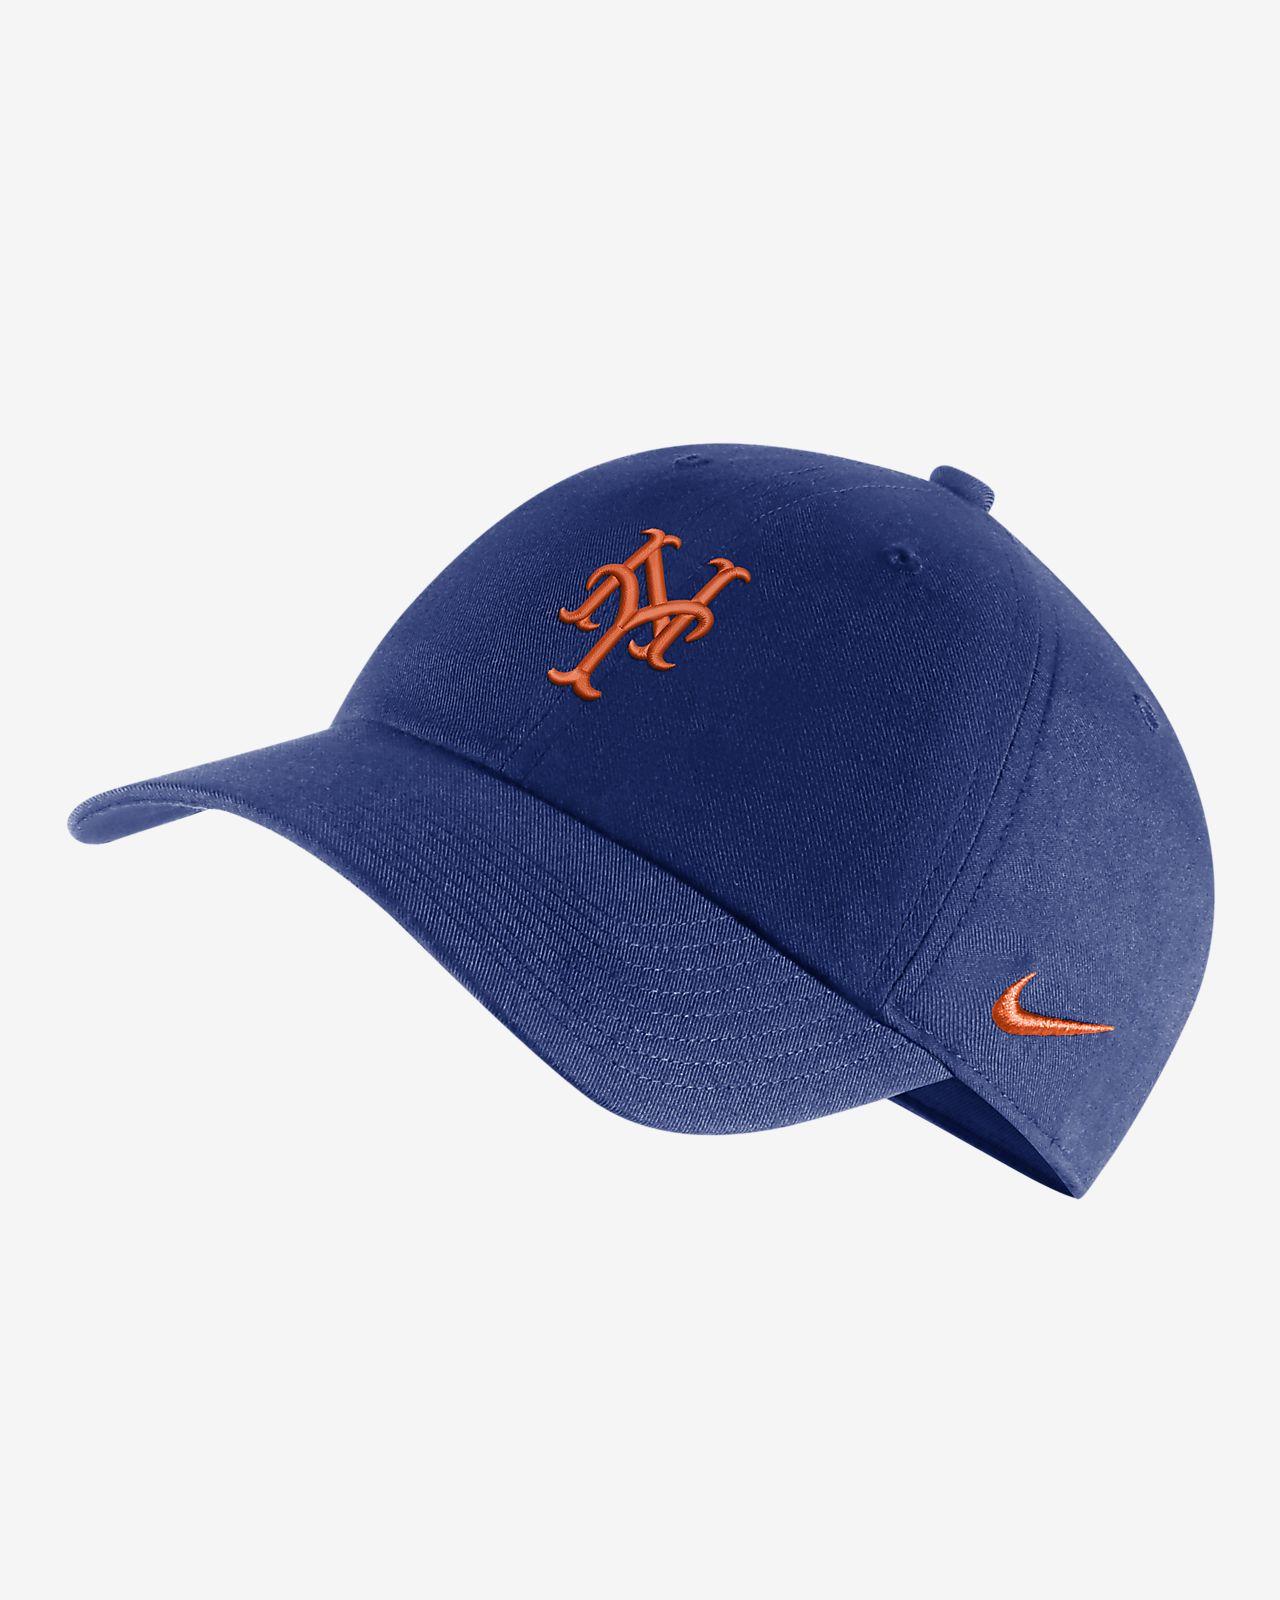 655b1f9fb72 Nike Heritage86 (MLB Mets) Hat. Nike.com